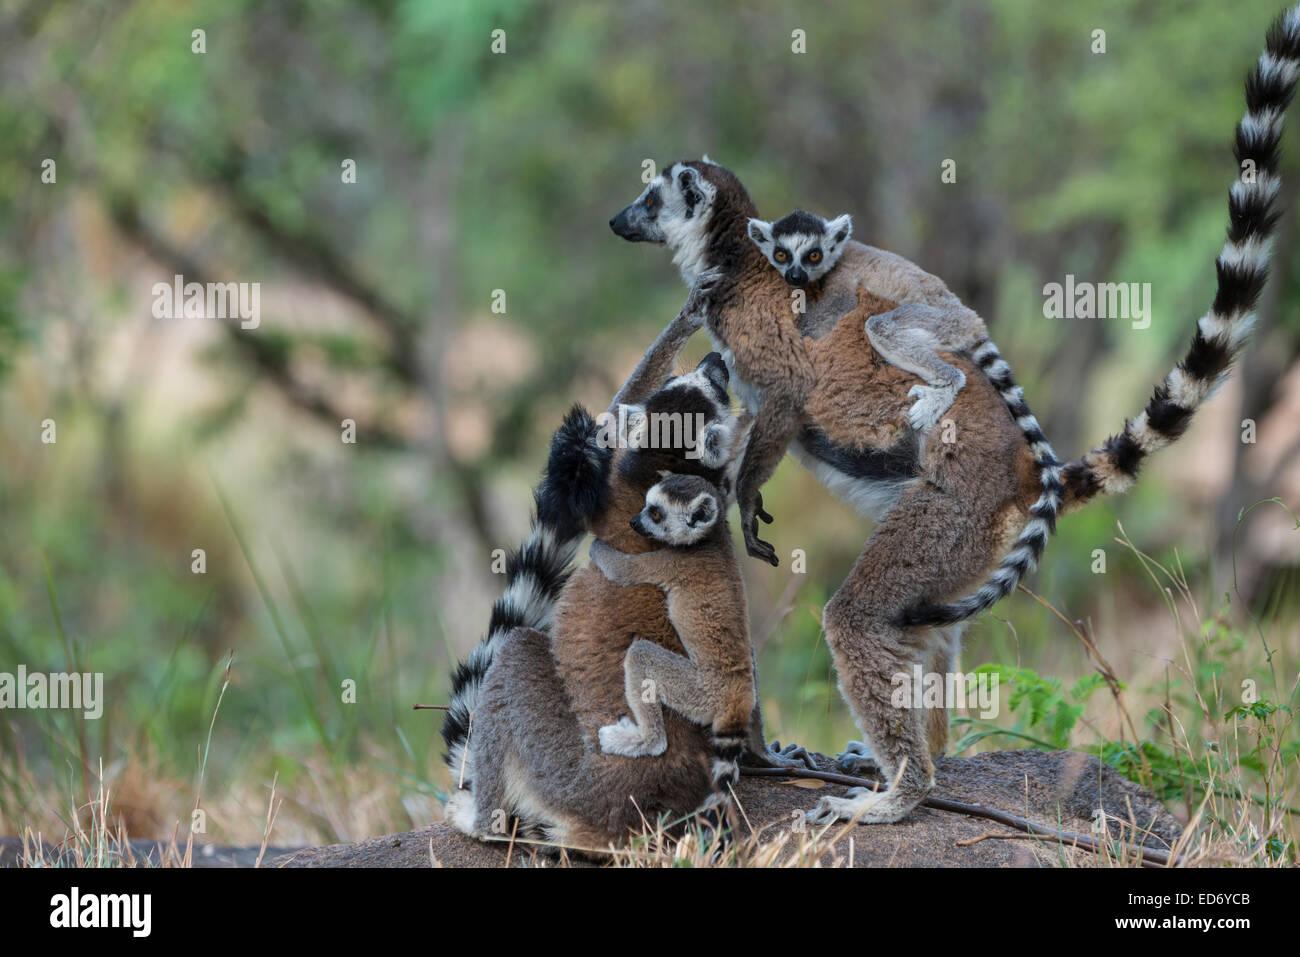 Kattas (Lemur Catta), Erwachsene mit jungen auf dem Rücken, Adringitra Region, Madagaskar Stockbild